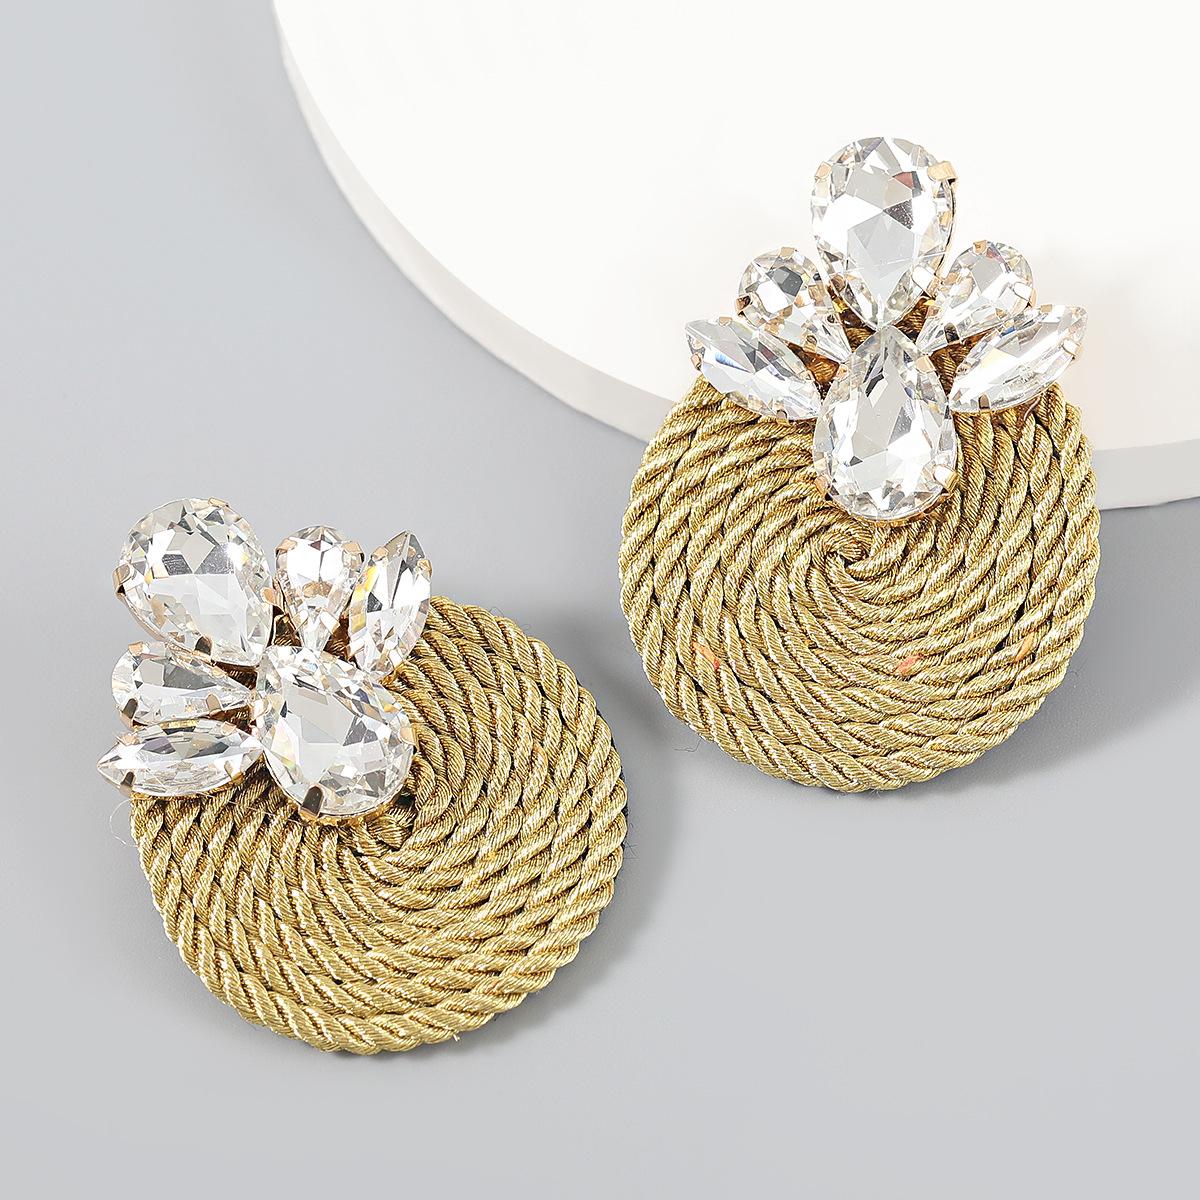 Sparkling Geometric Glass Diamond Alloy Earrings for Fabulous Looks